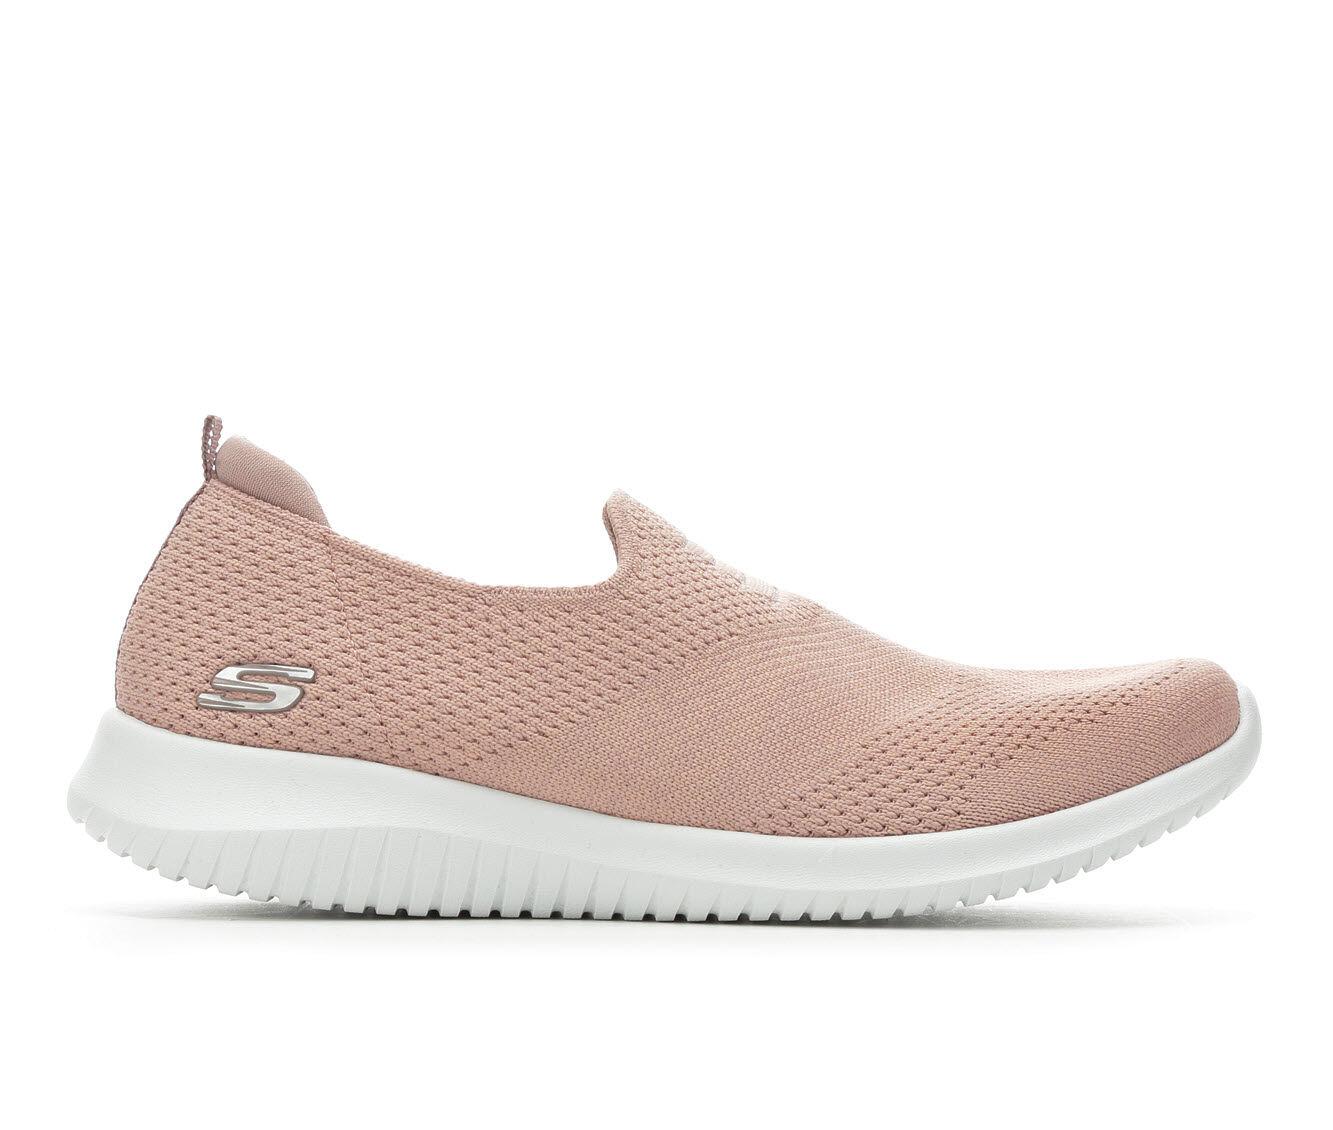 Women's Skechers Harmonious 13106 Sneakers Rose/White